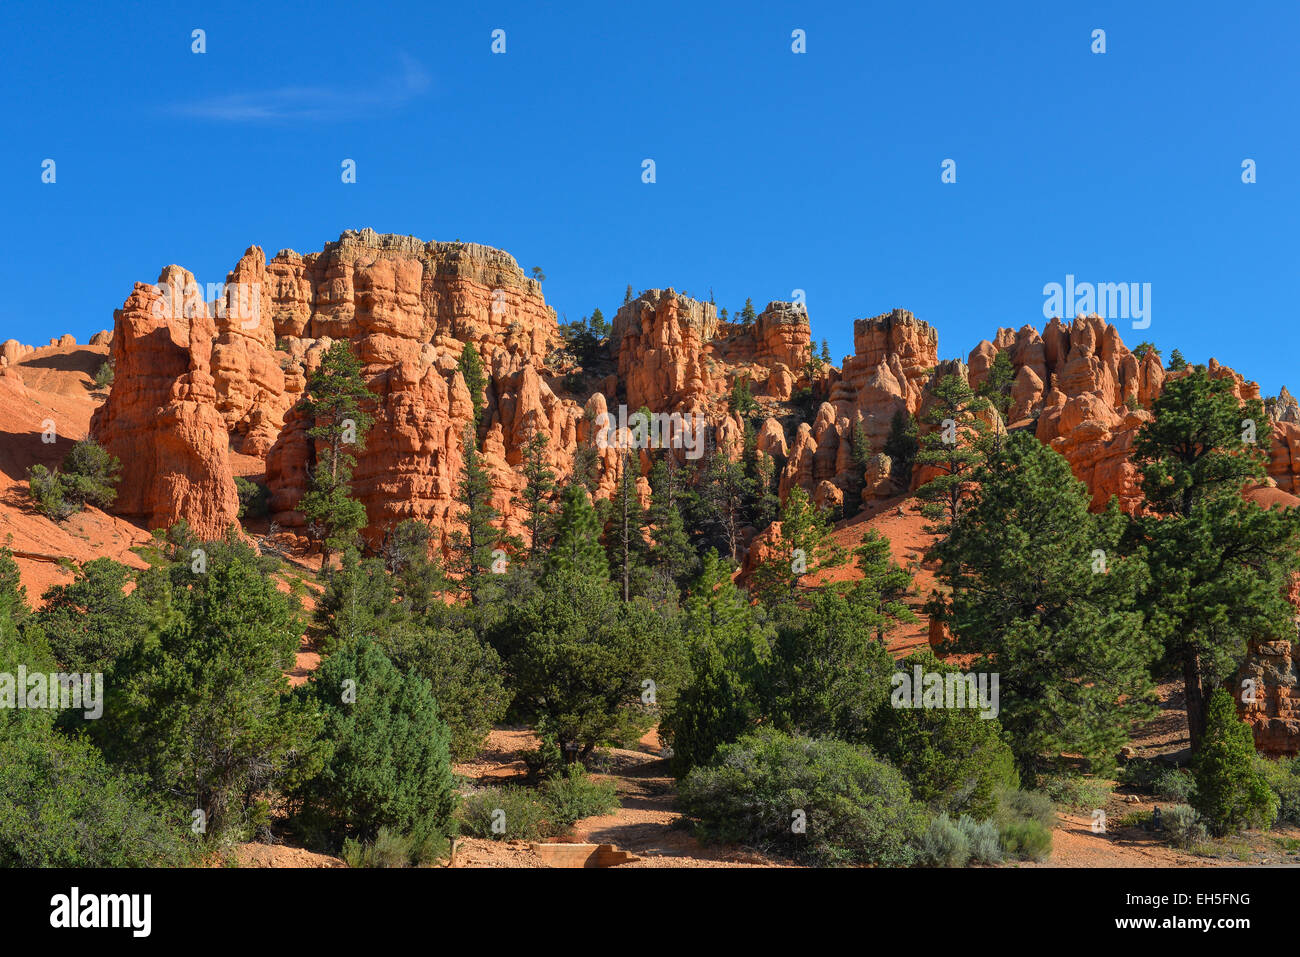 red rock formation in Cedar Breaks National Park, Utah - Stock Image